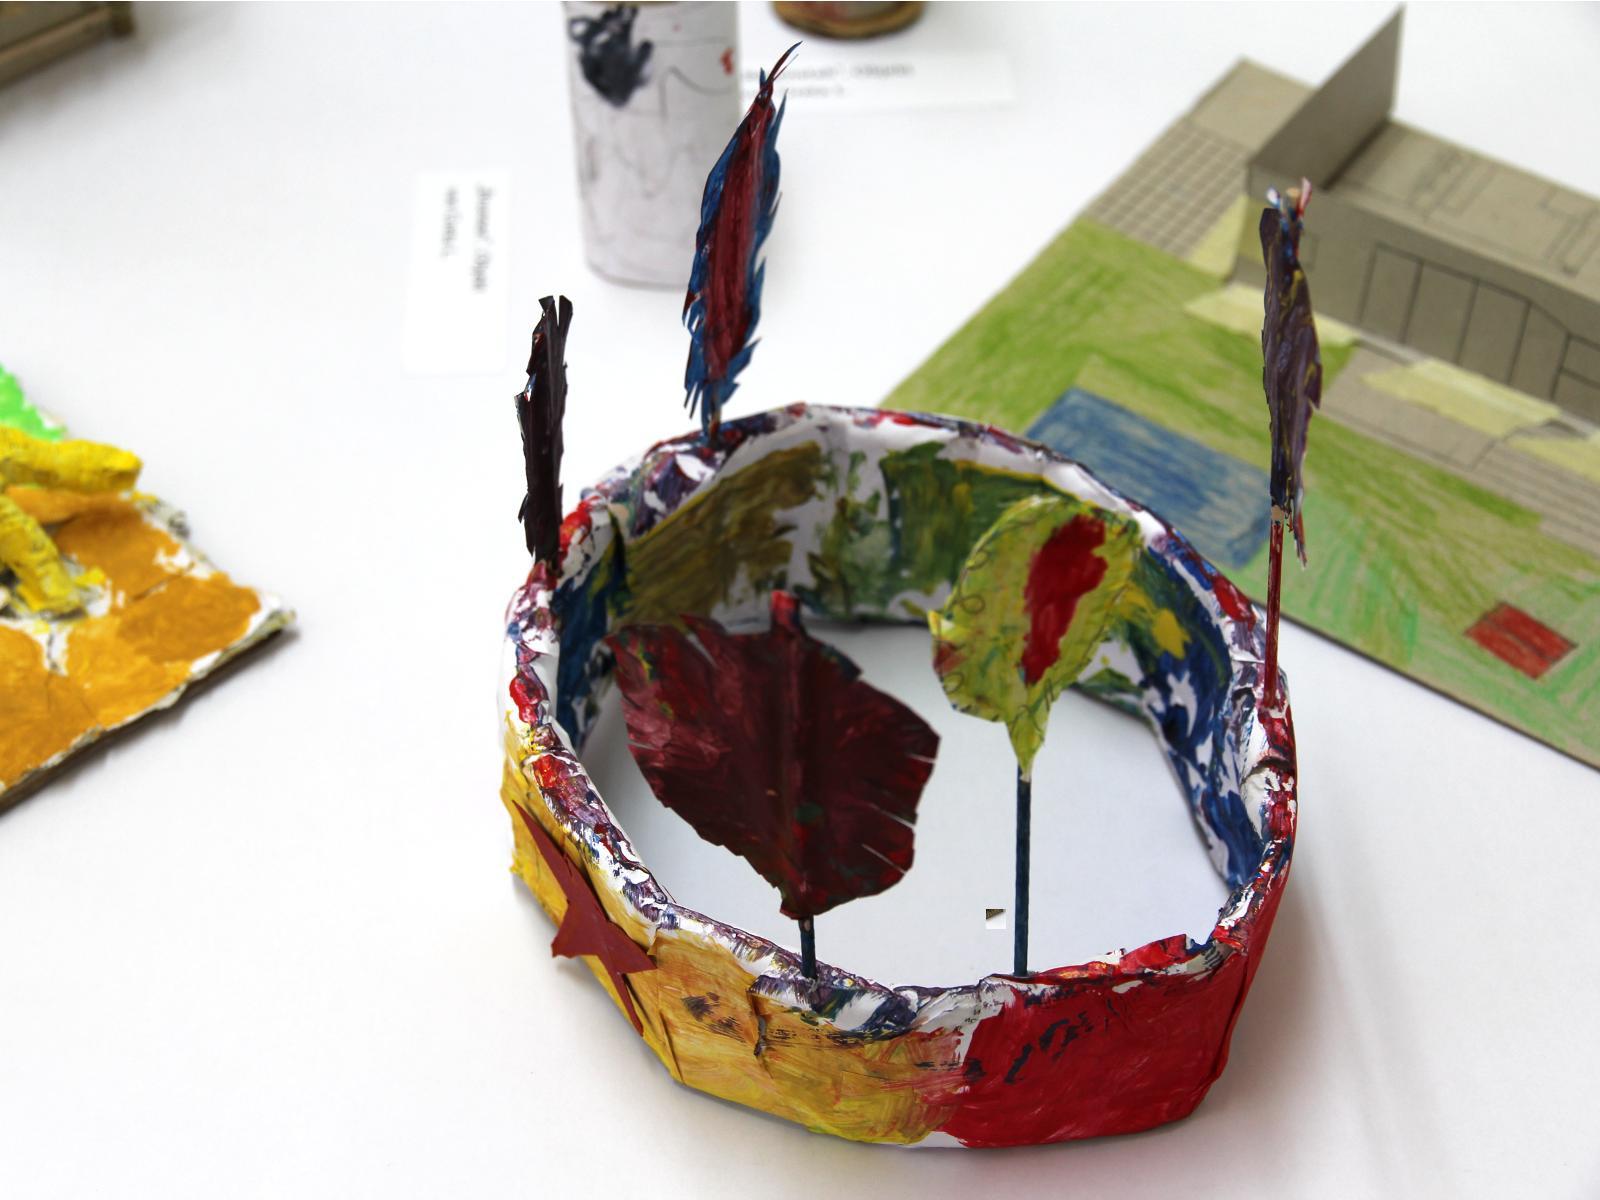 Kunstgespür Ausstellungen Berlin-Grünau Betrachtungen